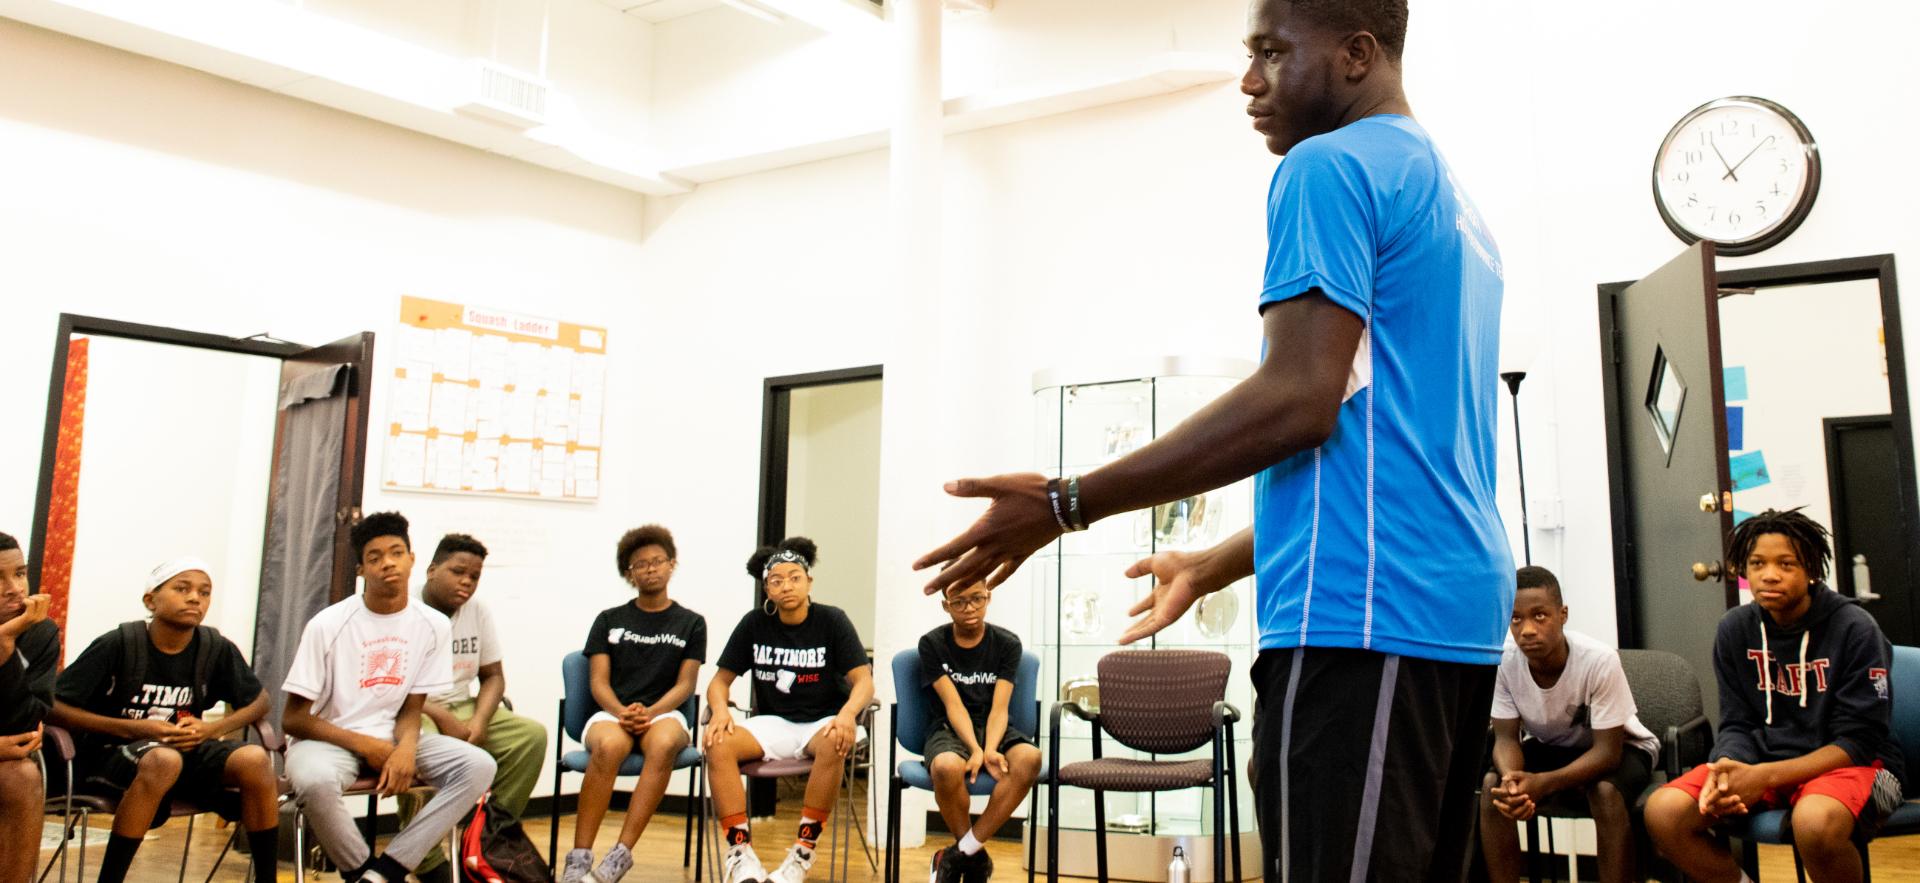 man addressing room full of sitting students